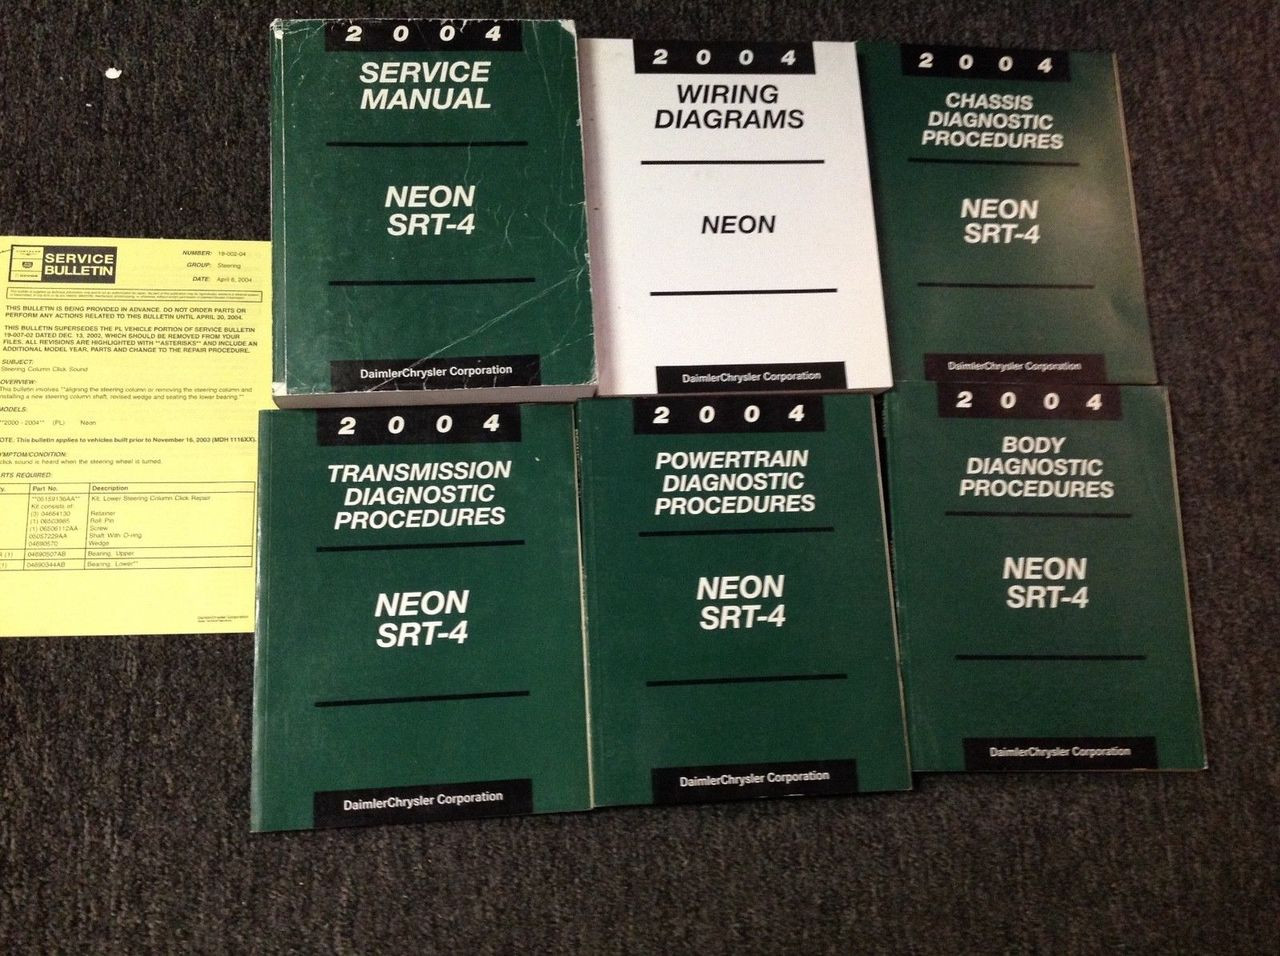 2004 Dodge Neon Srt 4 Service Repair Shop Manual Set W